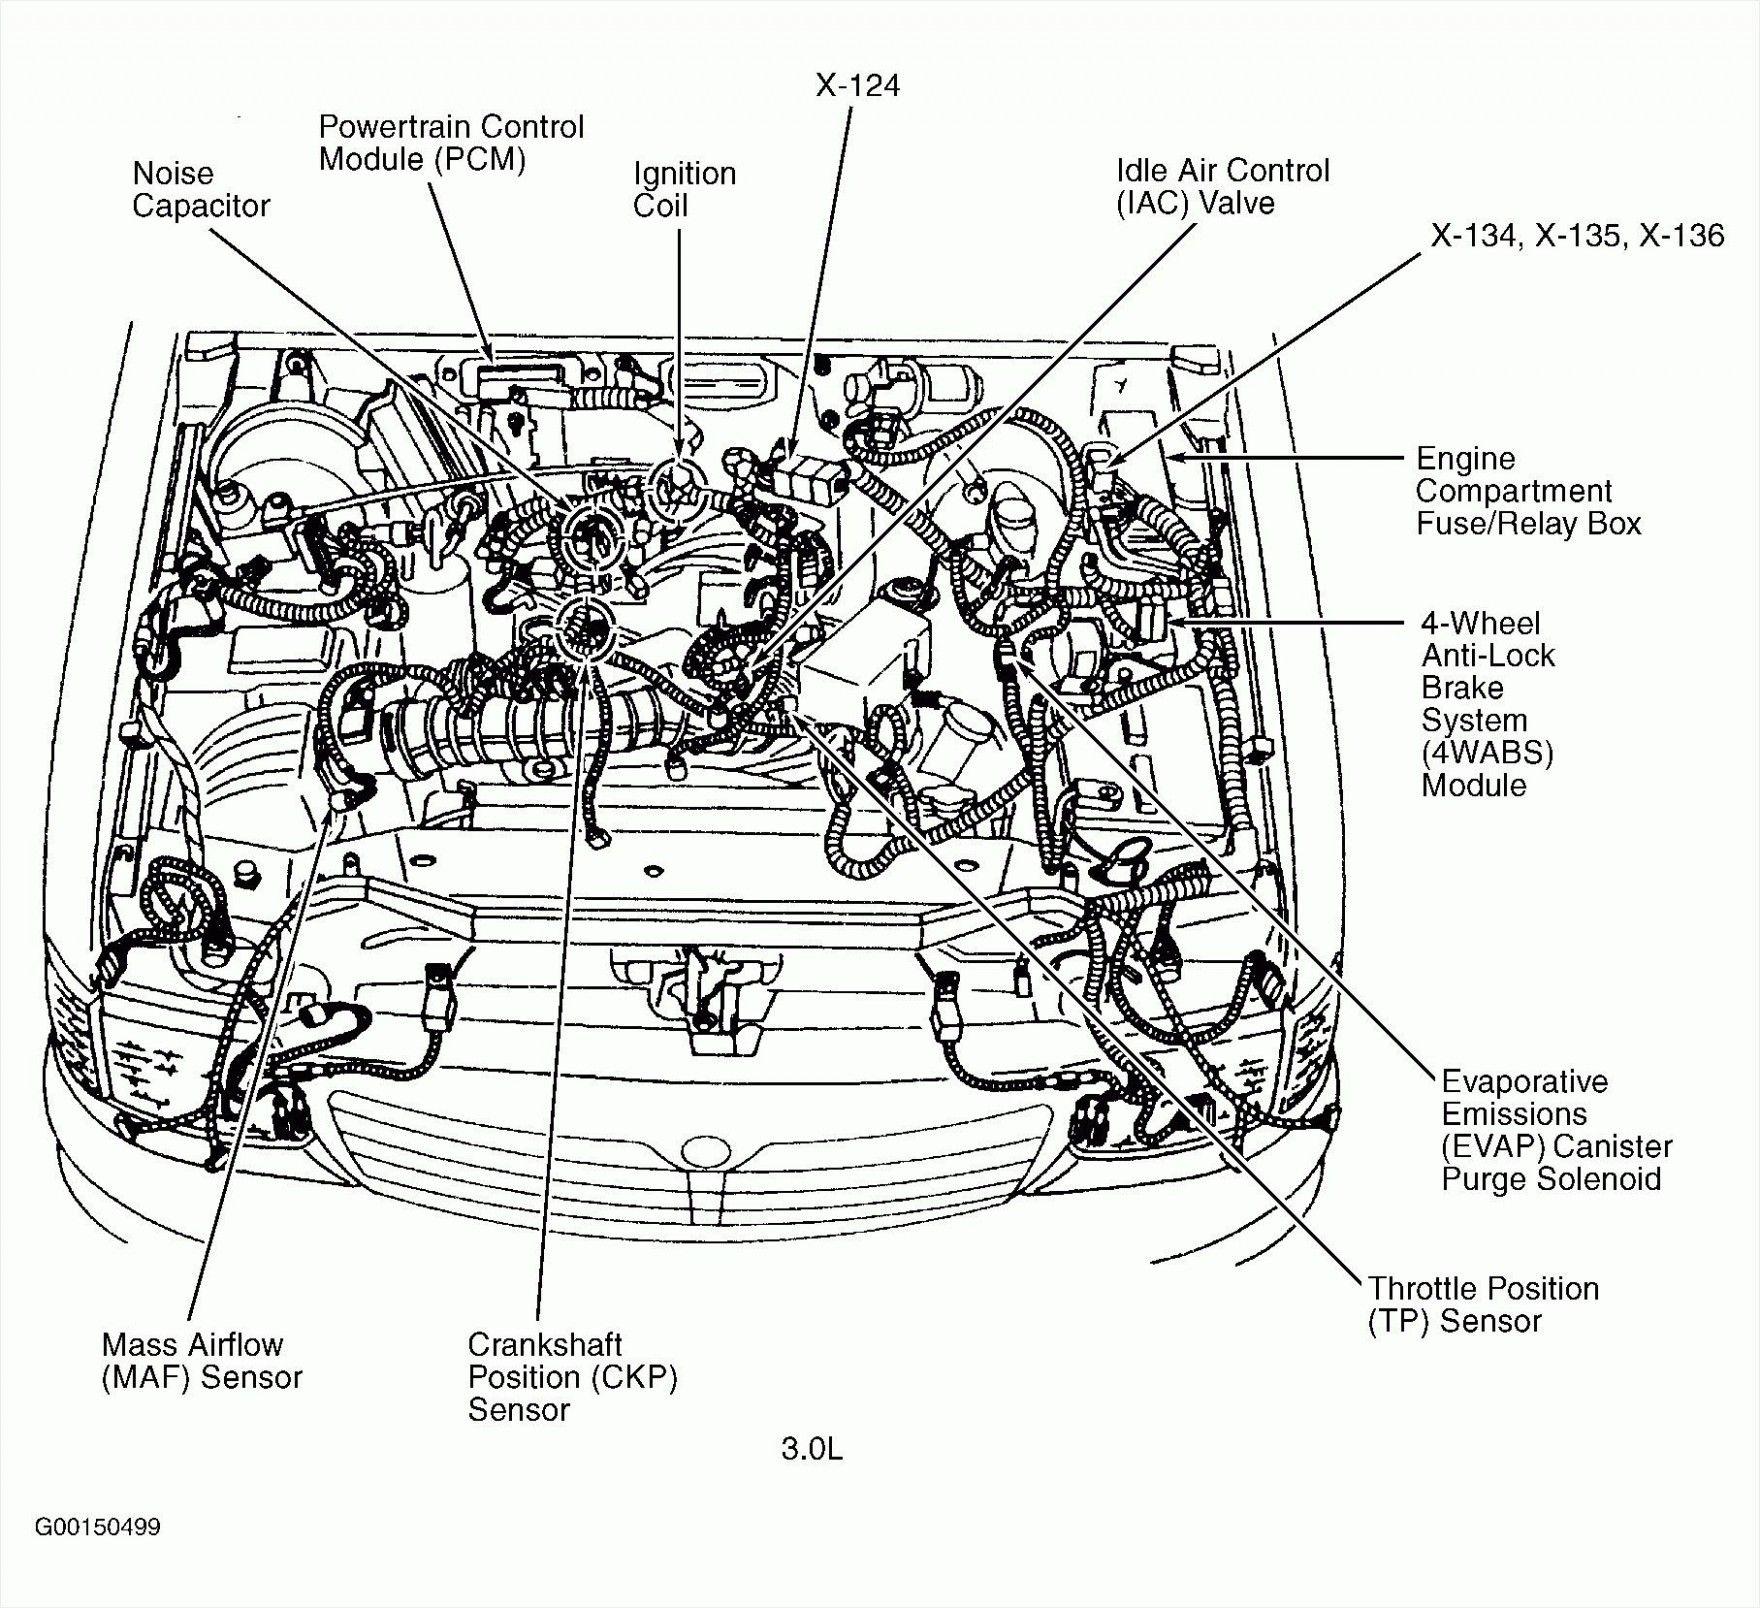 Tdi Engine Bay Diagram In 2020 Ford Ranger Ford Focus Engine Diagram